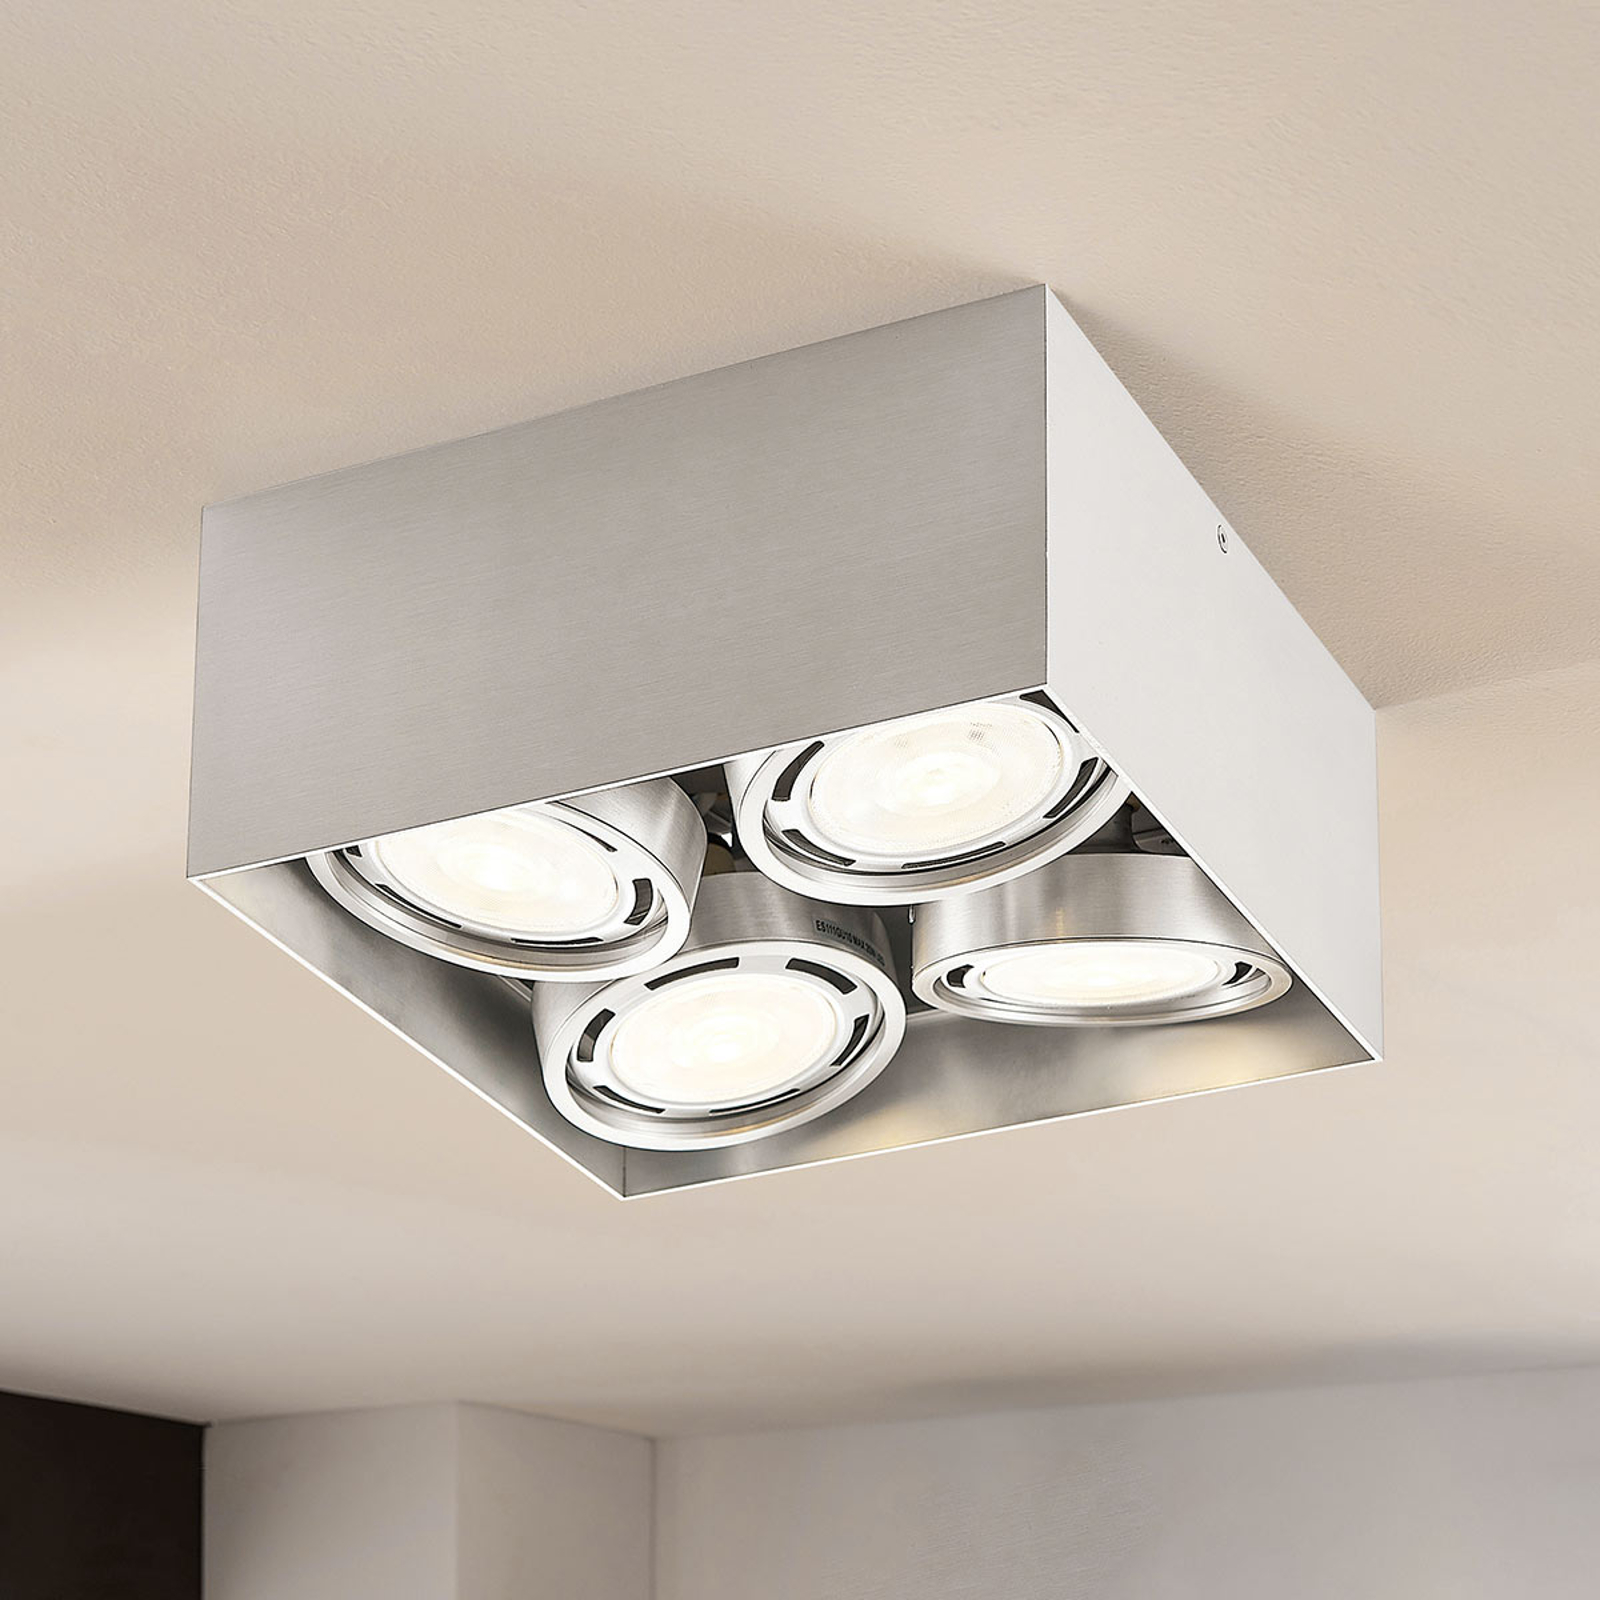 Downlight LED Rosalie à 4 lampes, angulaire, alu